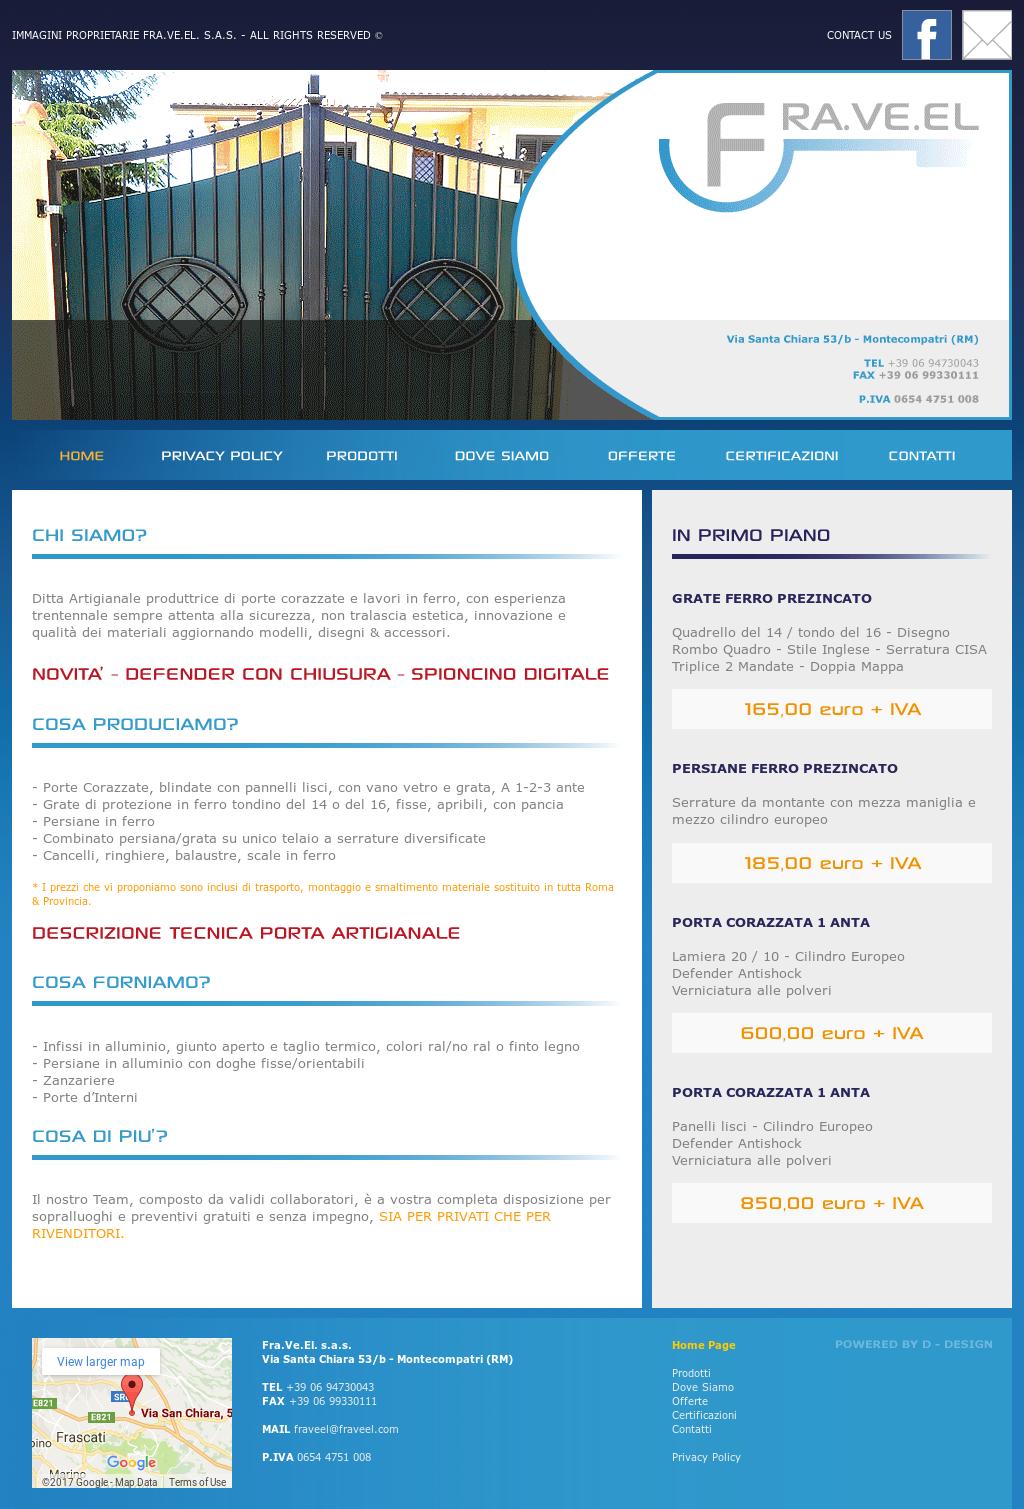 Colori Infissi In Alluminio fraveel porte blindate competitors, revenue and employees